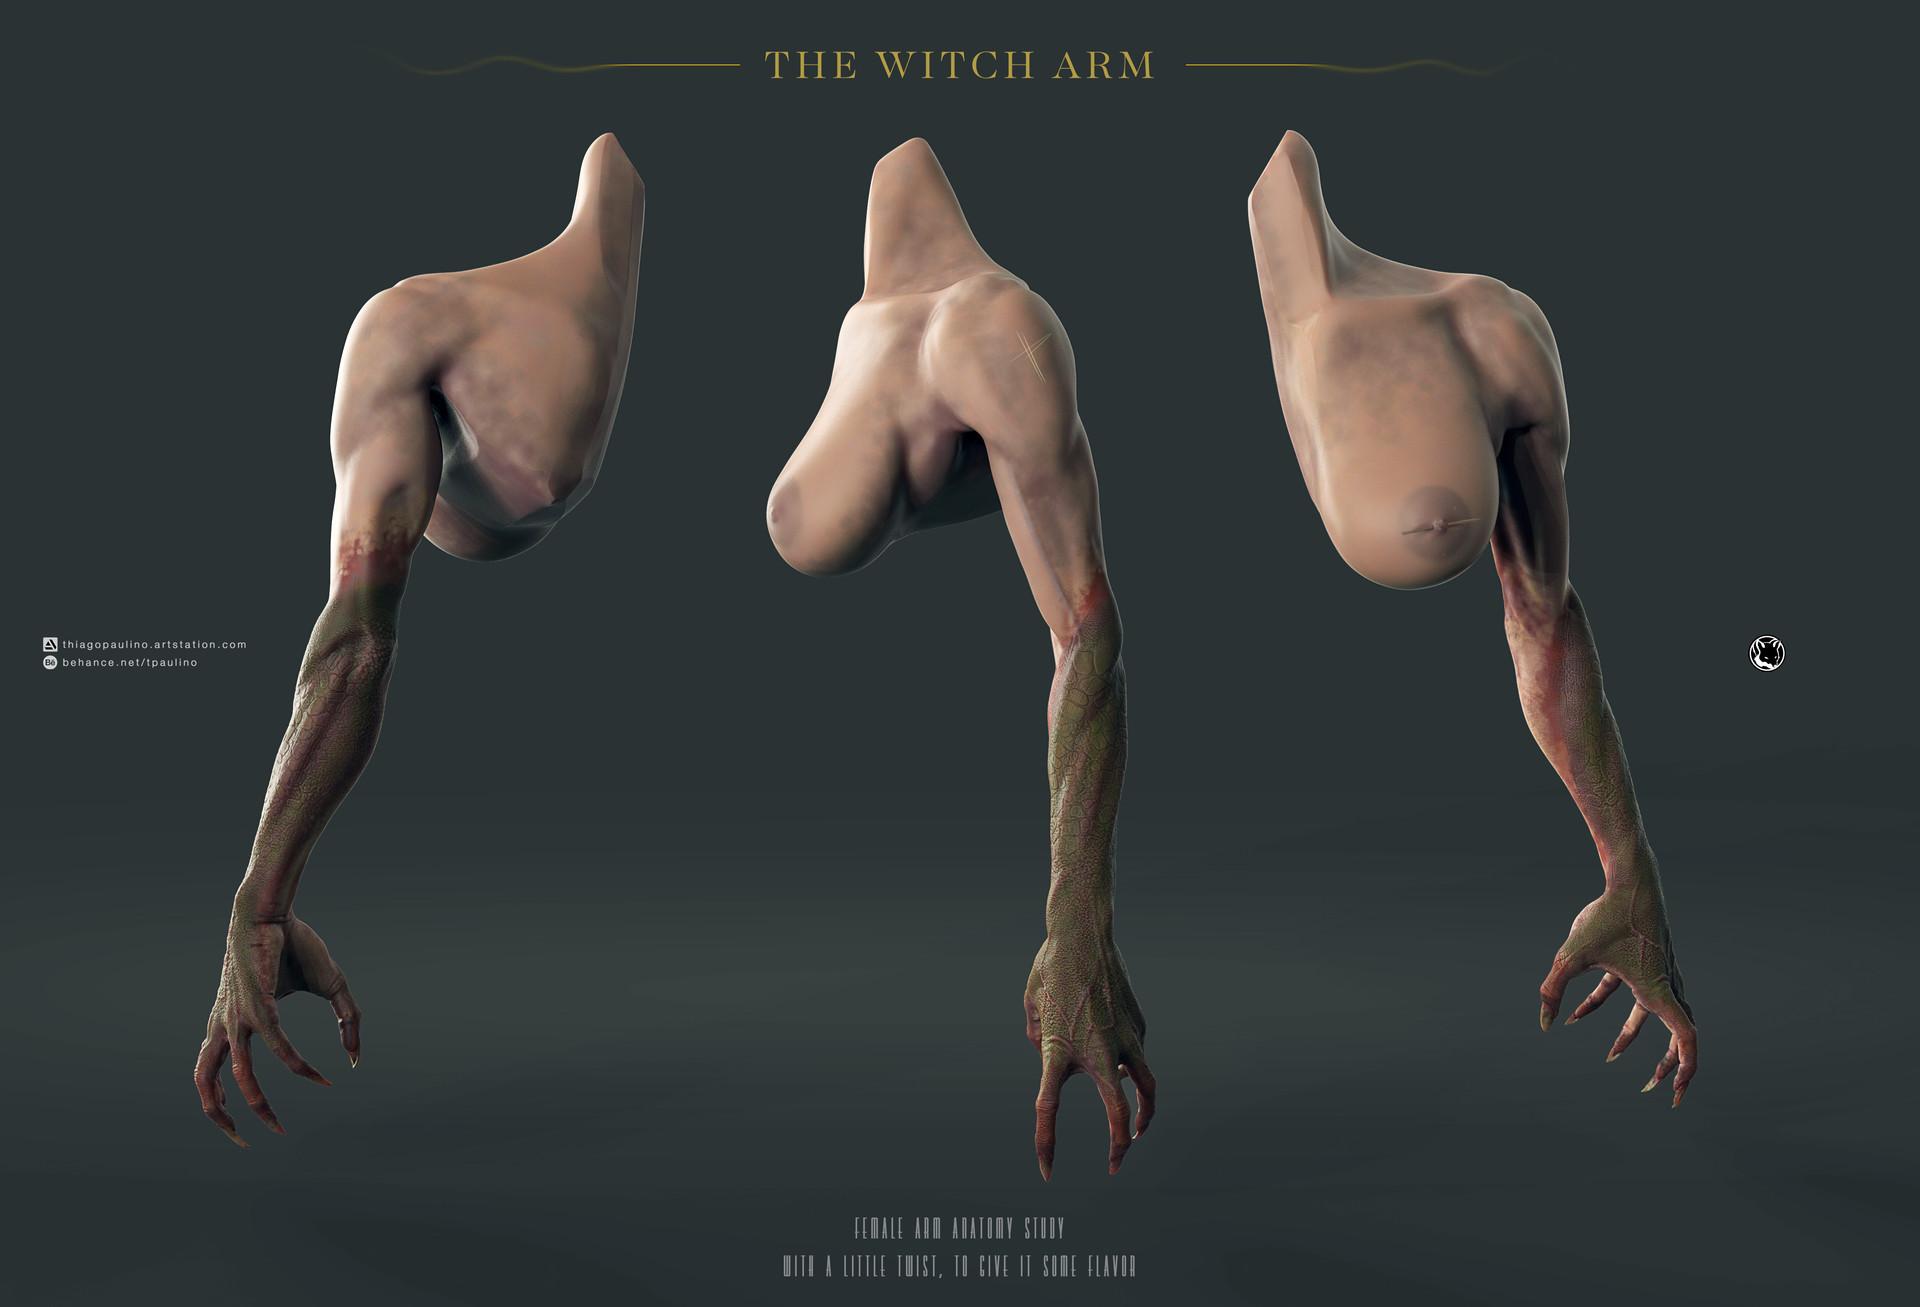 Thiago Paulino - The Witch Arm